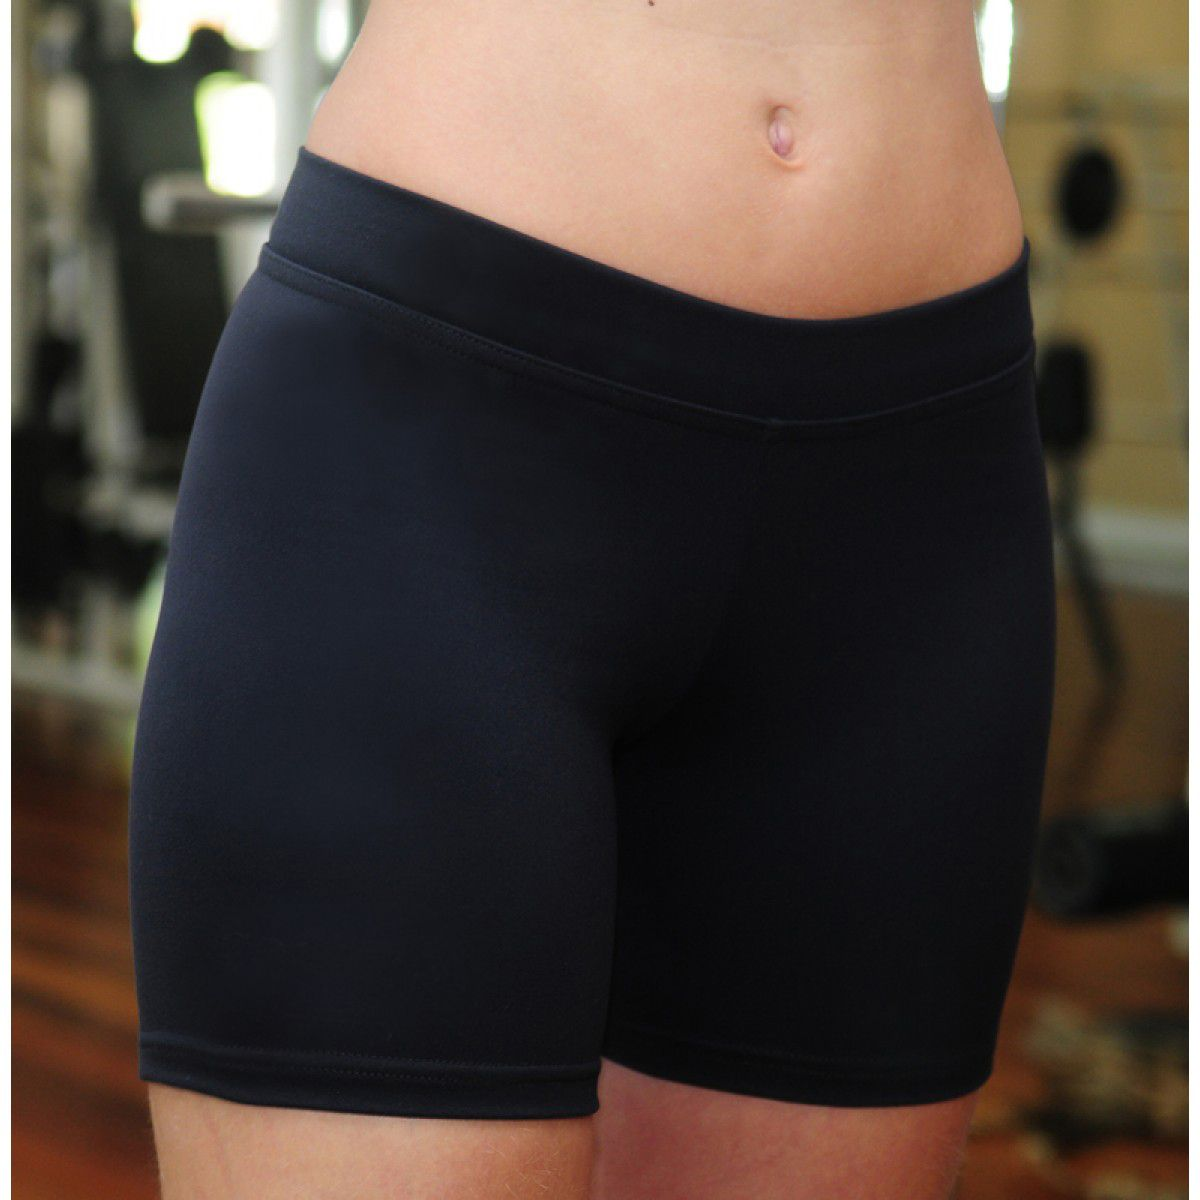 Shorts Anticelulite Cós Baixo  - Magnephoton